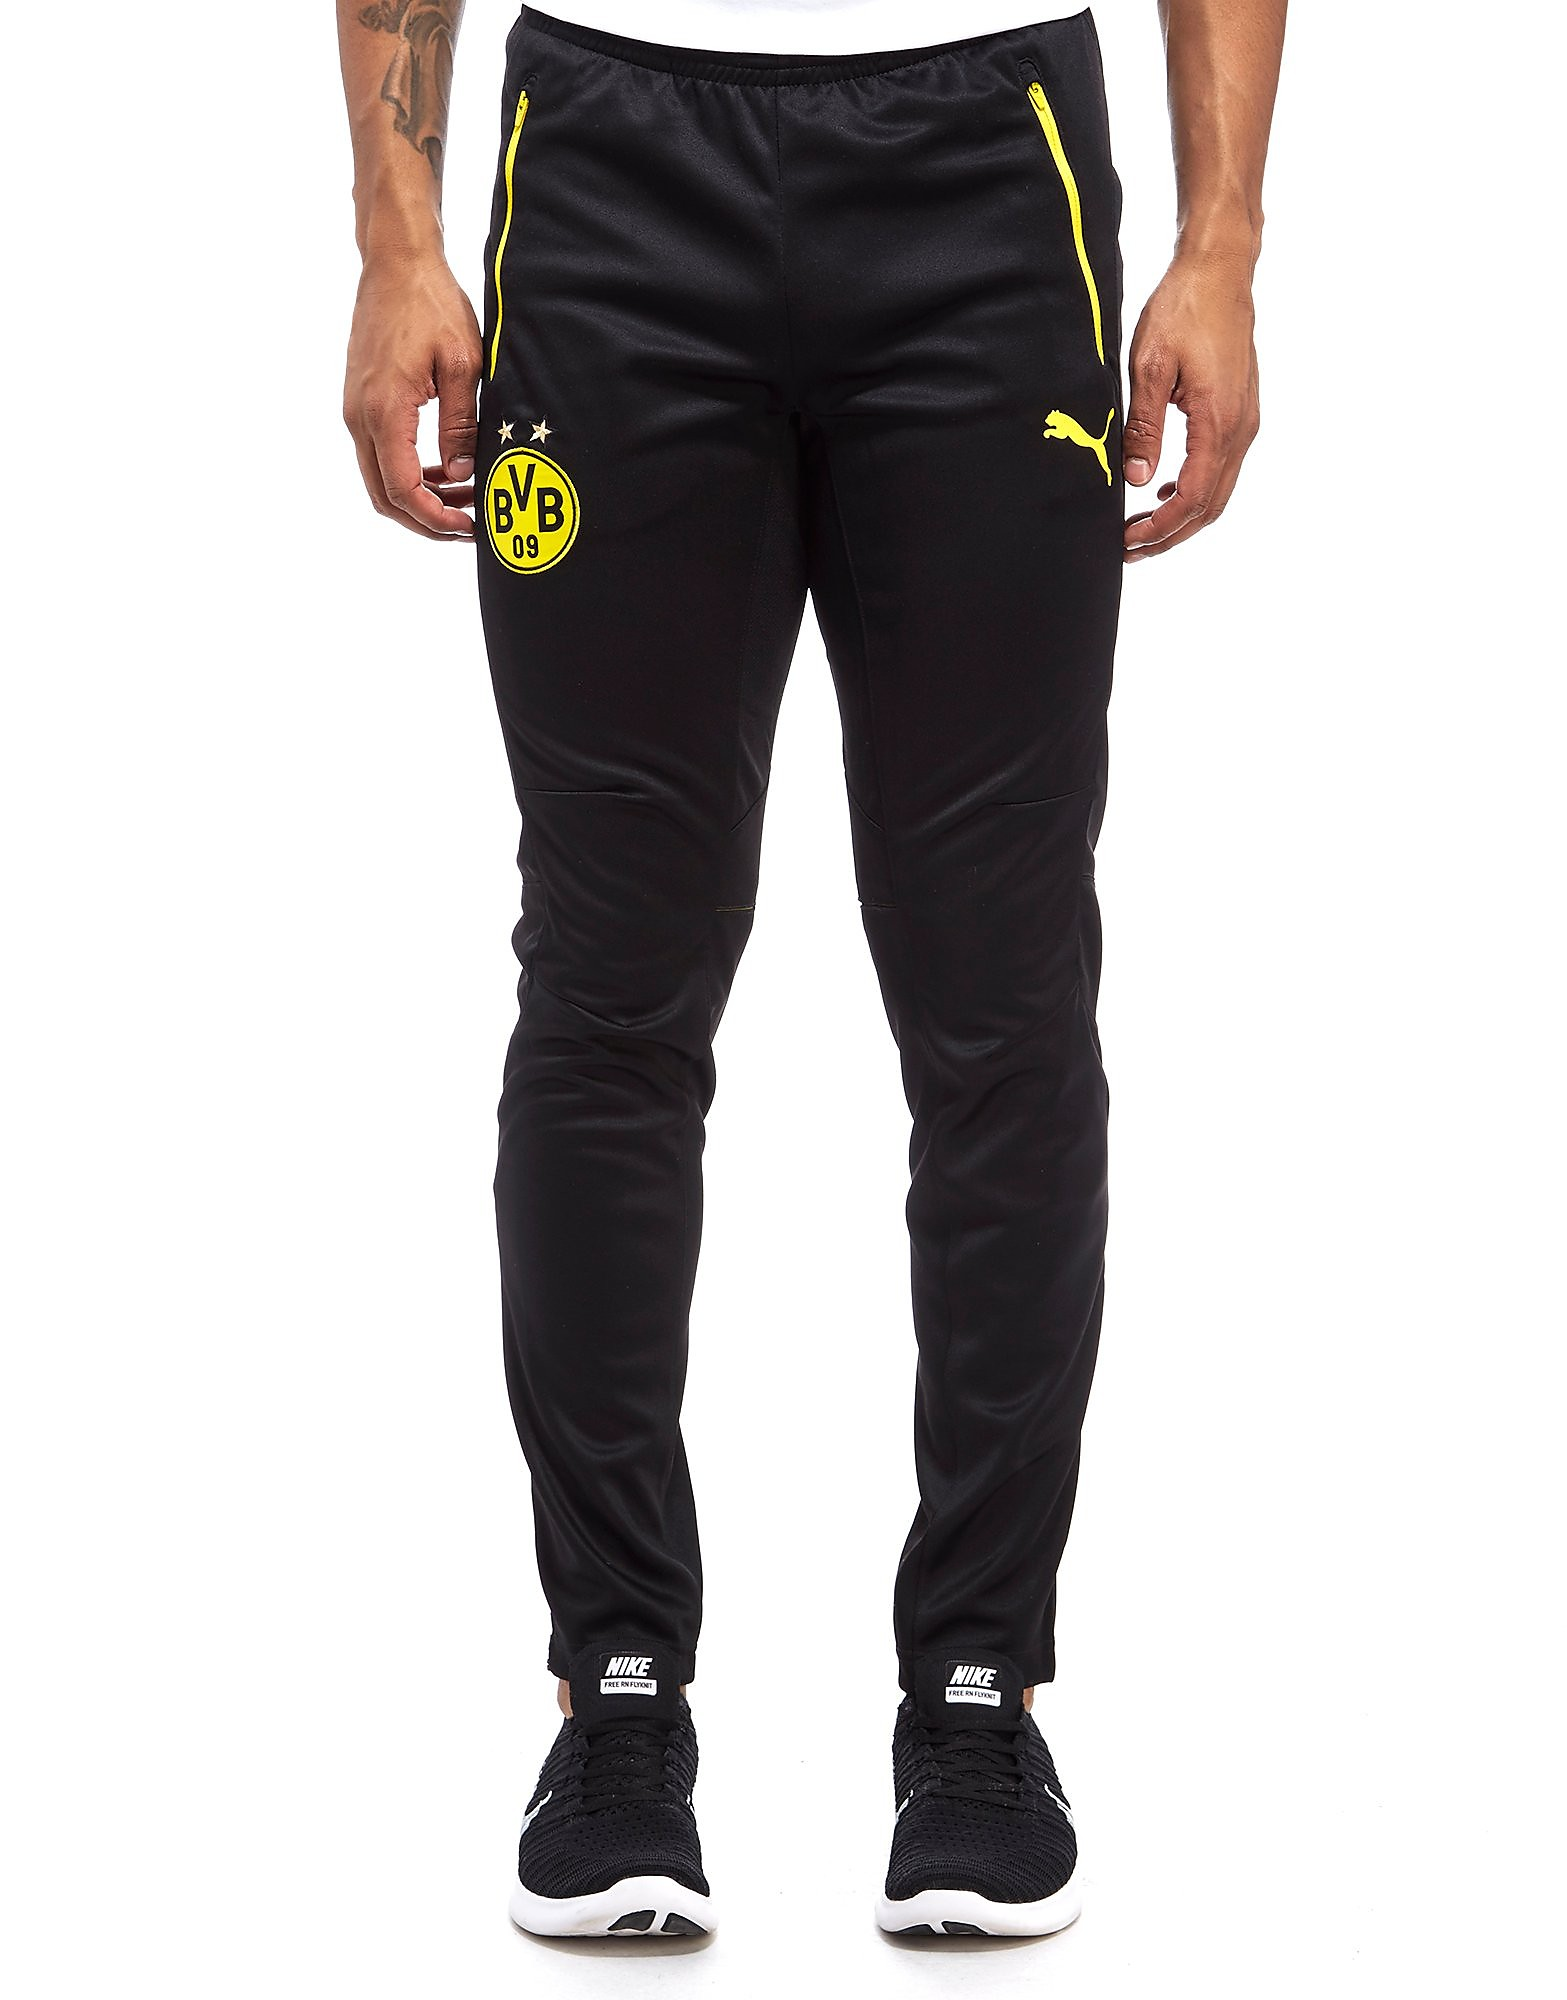 PUMA Borussia Dortmund 2017 Training Pants PRE ORDER